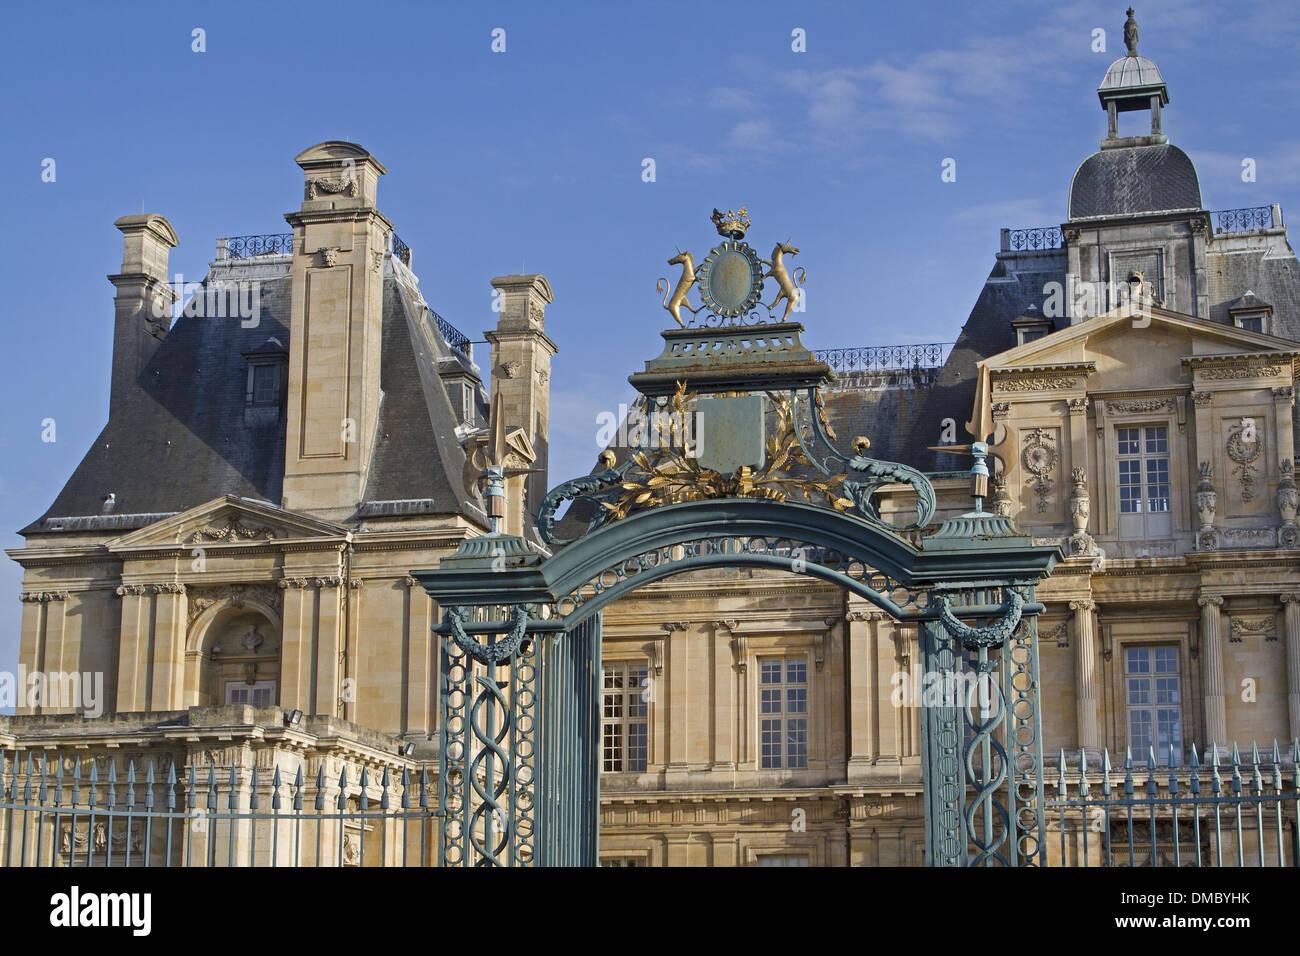 France Yvelines Maisons Laffitte Castle Stock Photos &amp- France ...